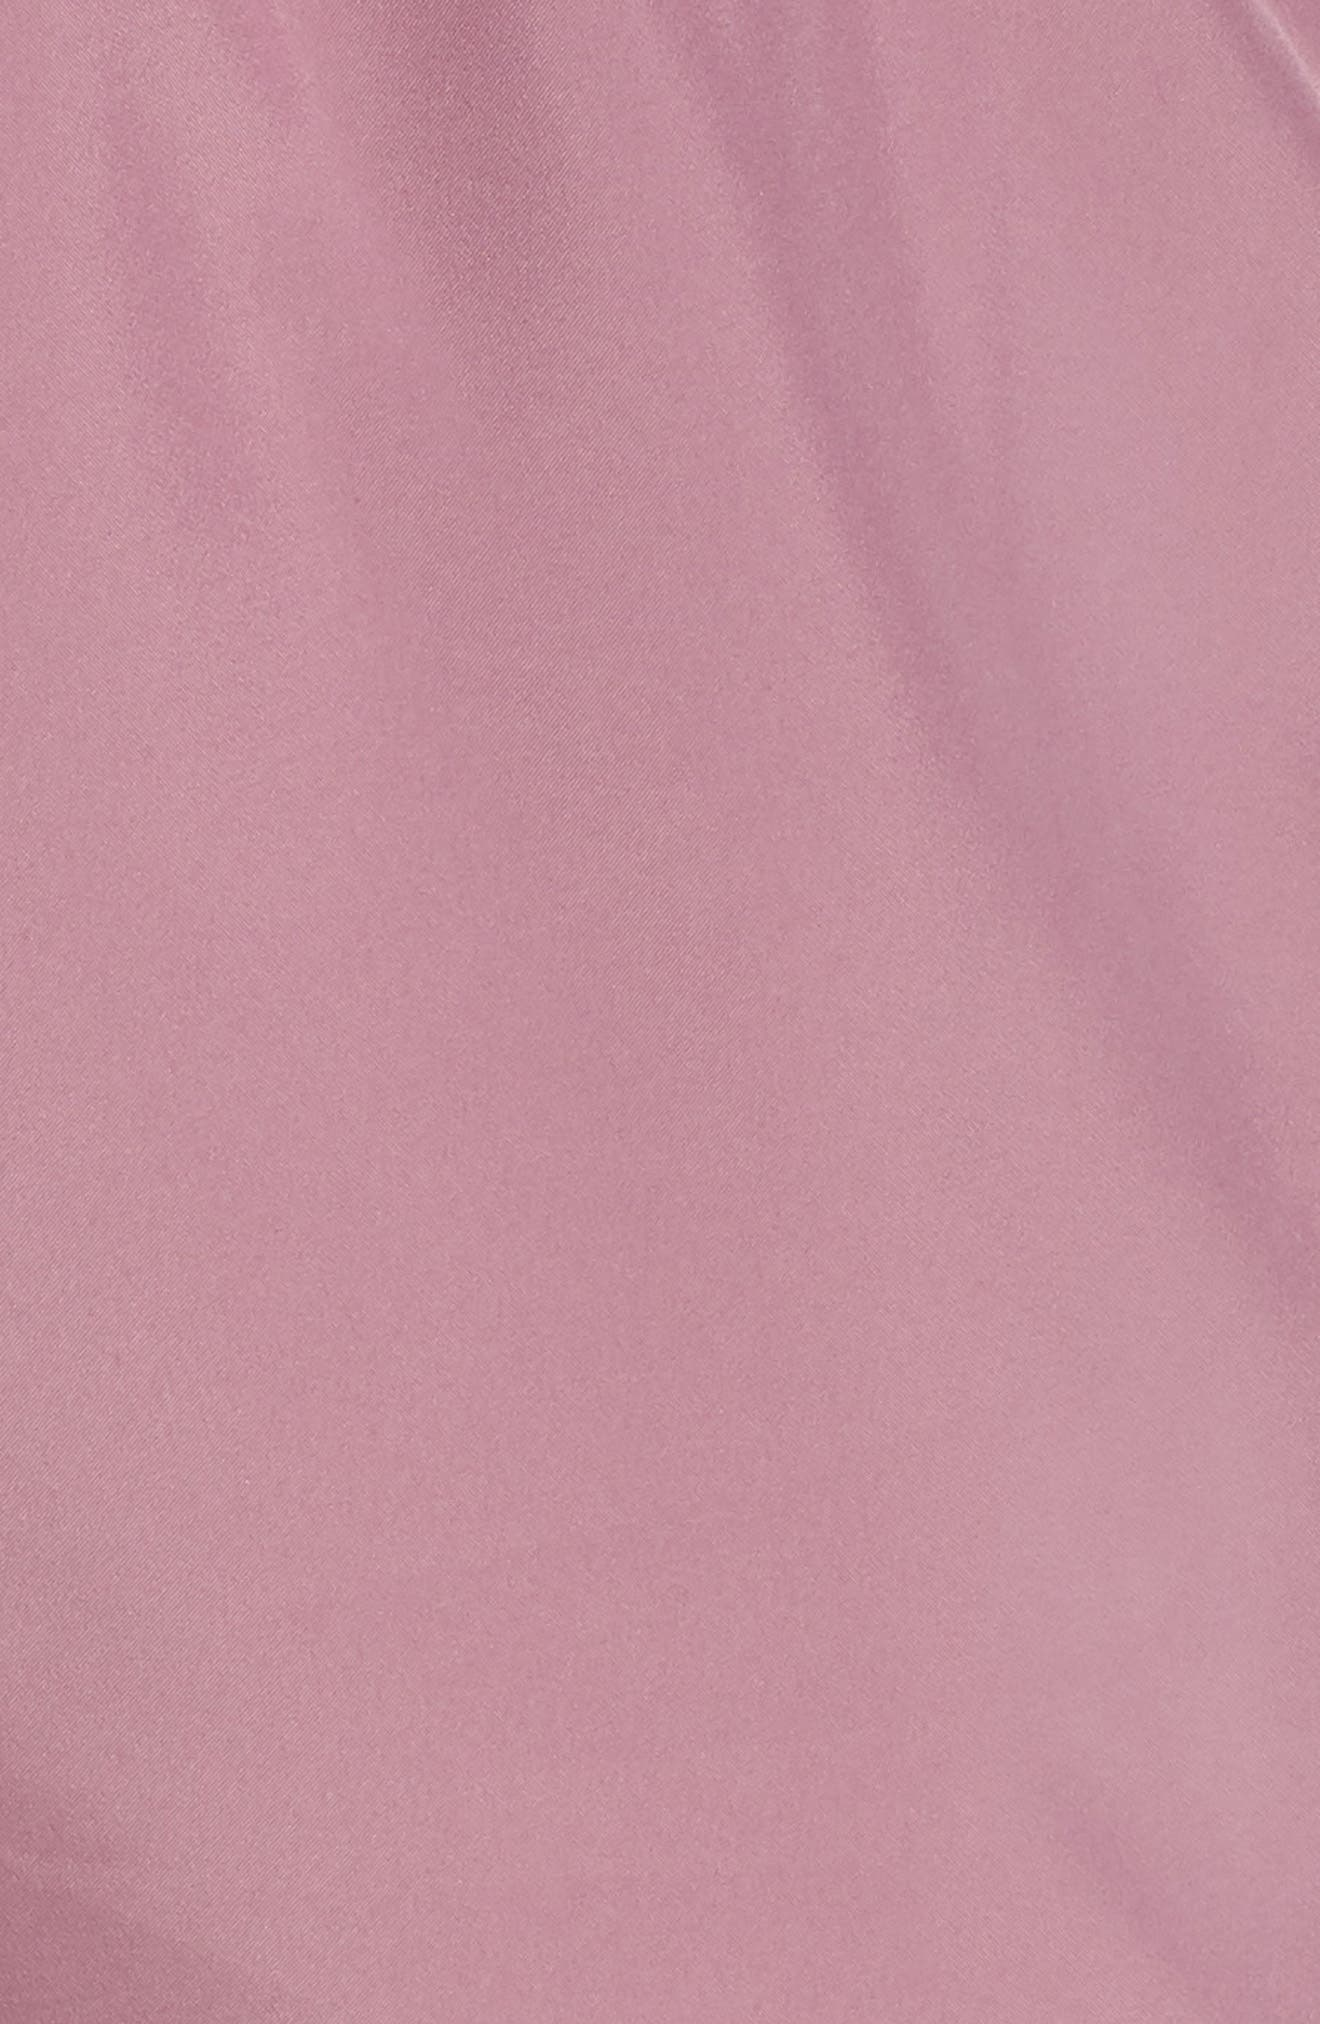 NIKE, Dry Tempo High Rise Running Shorts, Alternate thumbnail 6, color, PLUM/ EL DORADO/ WOLF GREY